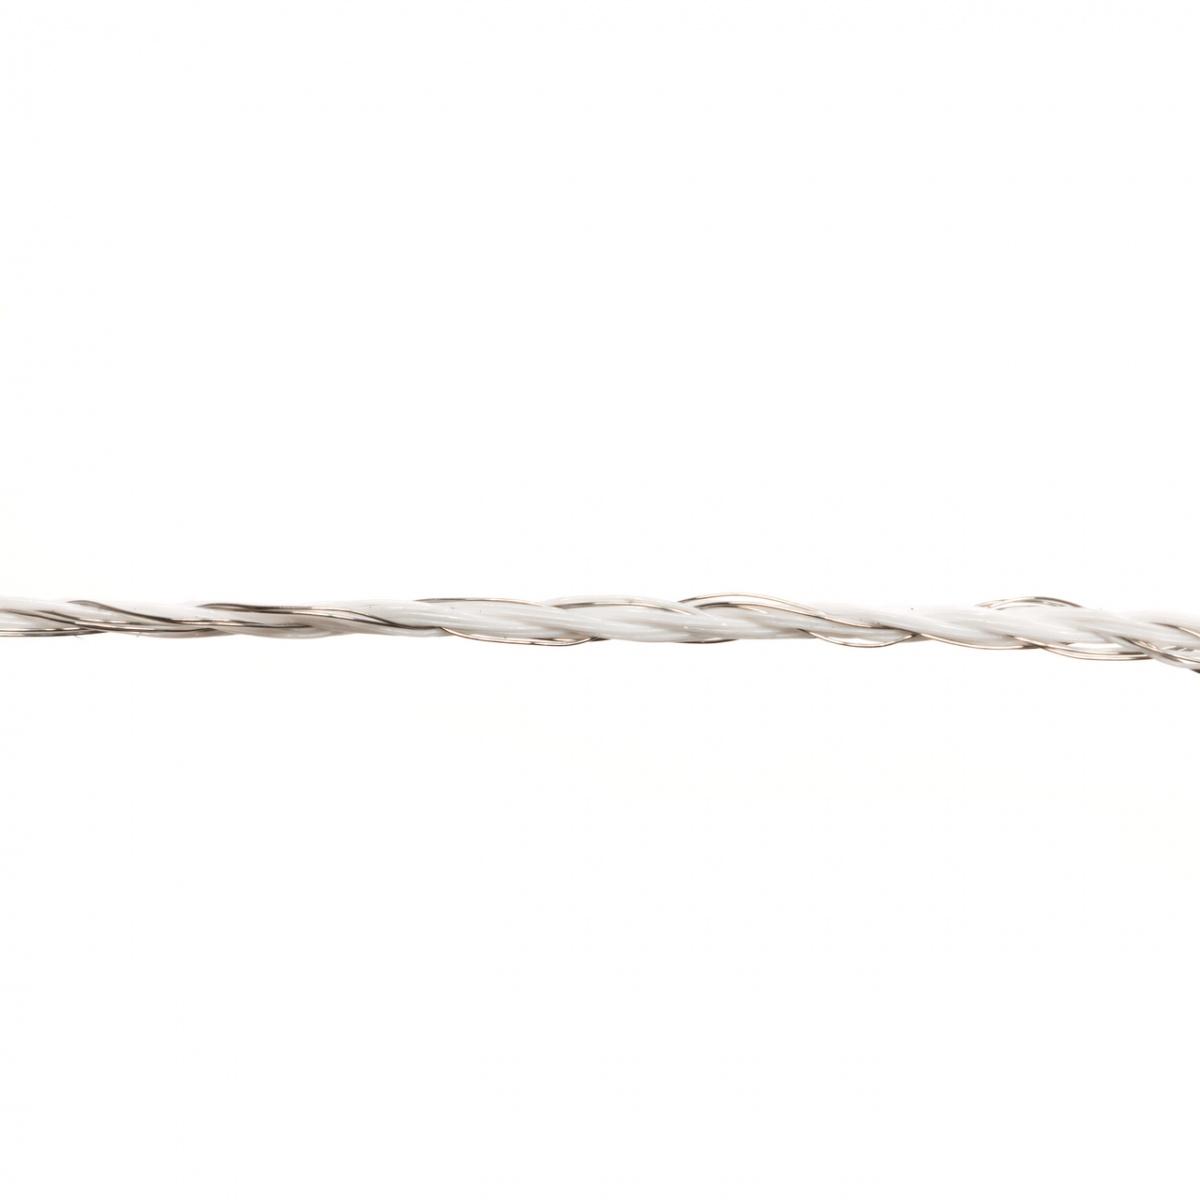 Villanypásztor zsinór - 400m - 100kg - 3,45Ω/m